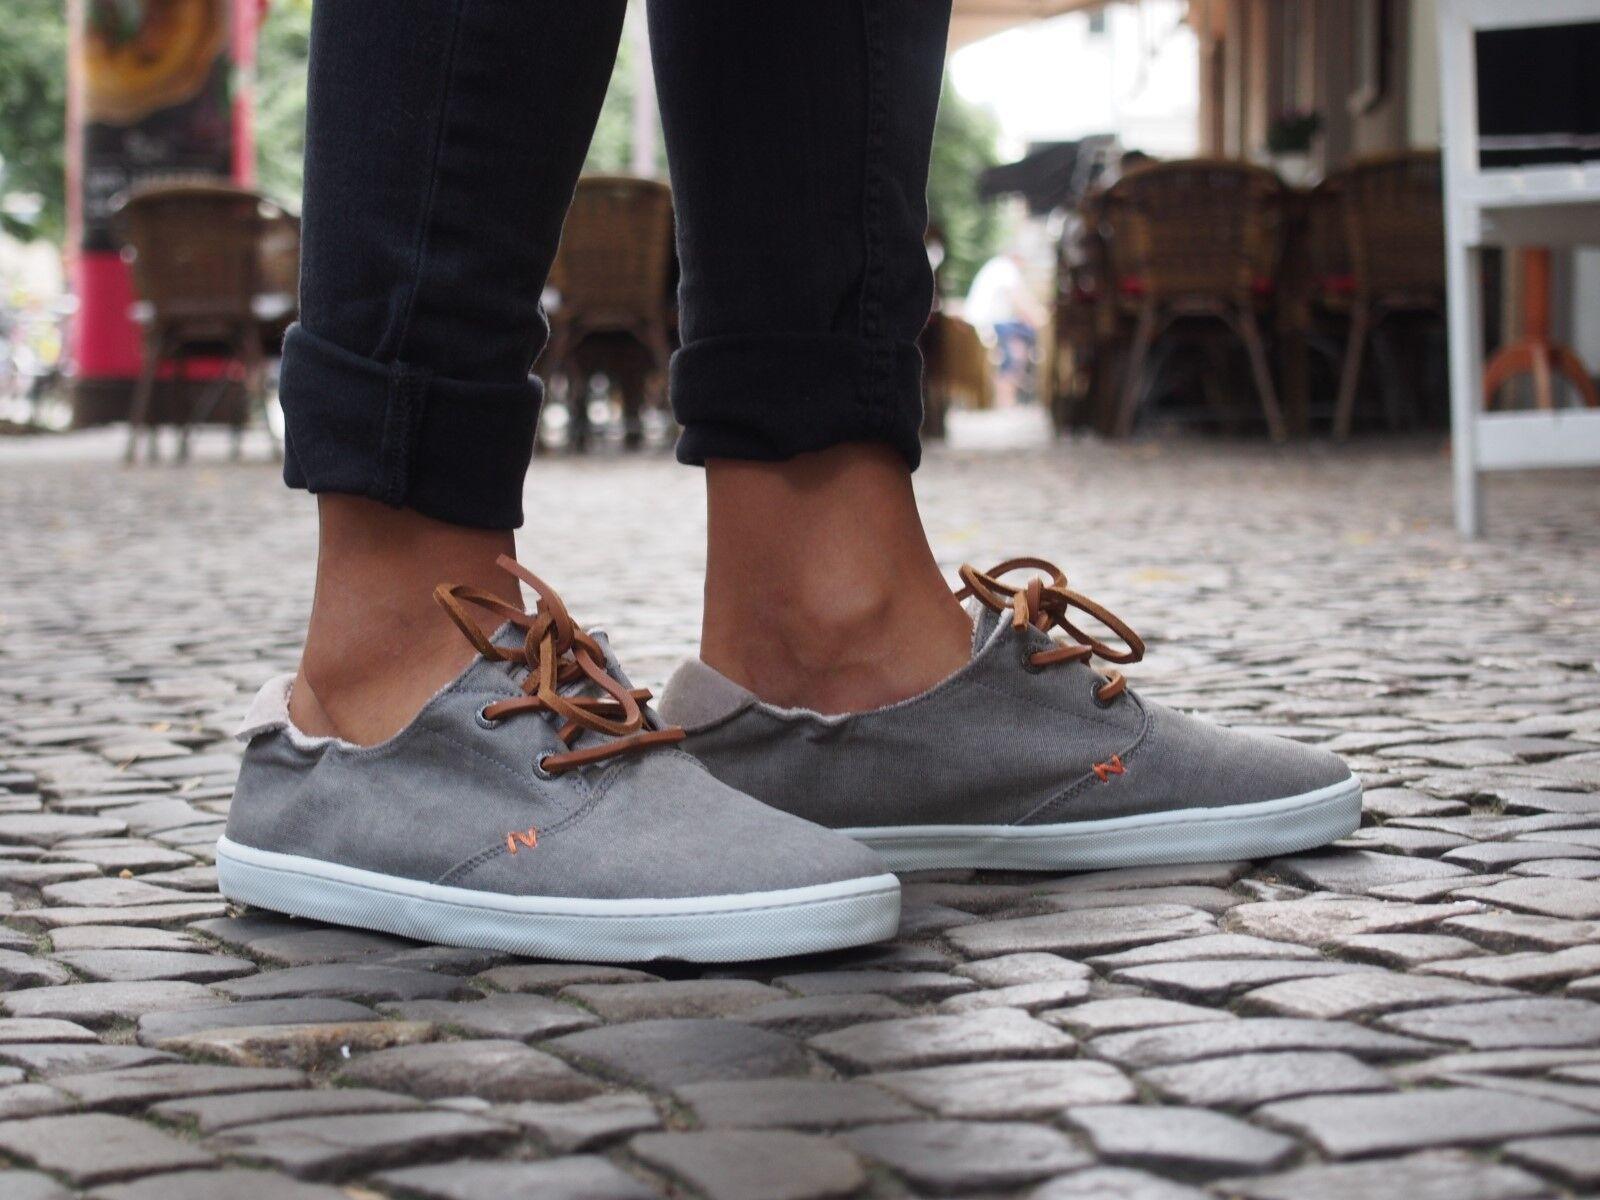 HUB Footwear Schuhe KYOTO C06 grau Grauish Canvas Sneakers NEU Damen Halbschuhe